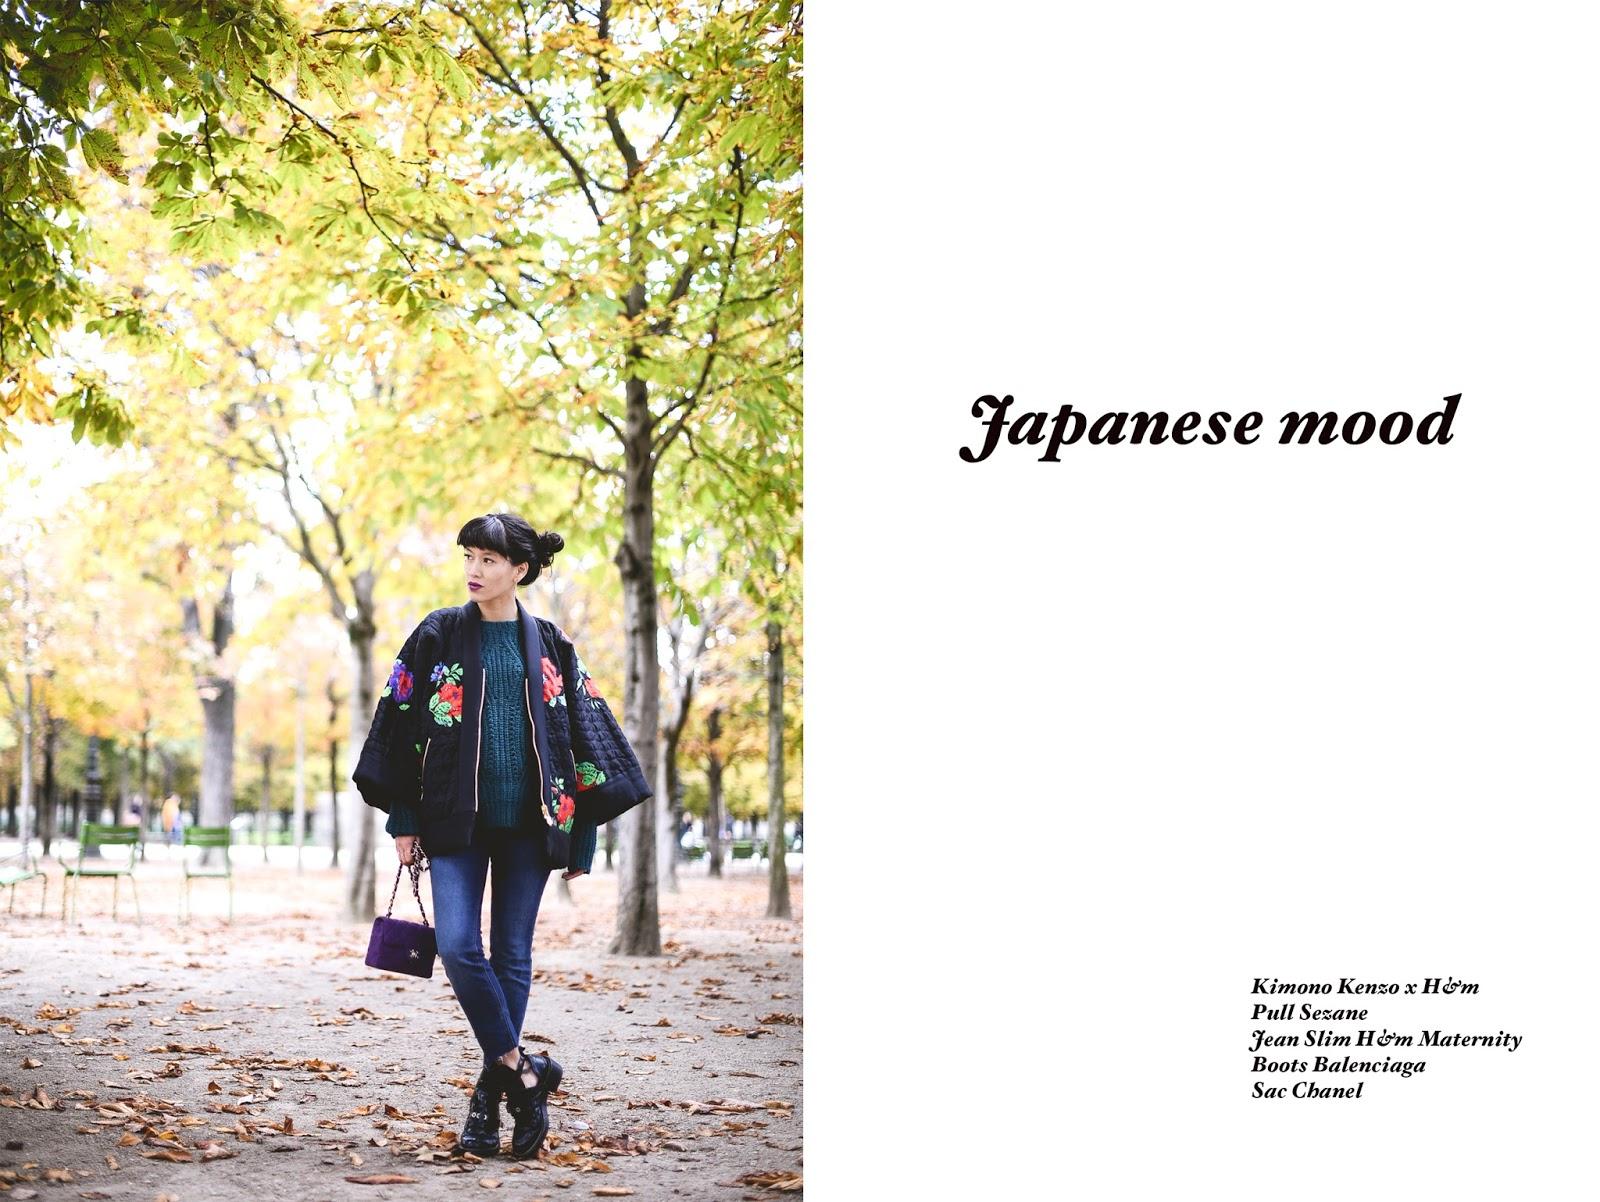 Japanese Japanese Mood Dressing Leeloo De Le wqOTgp 46b3a0a2d57